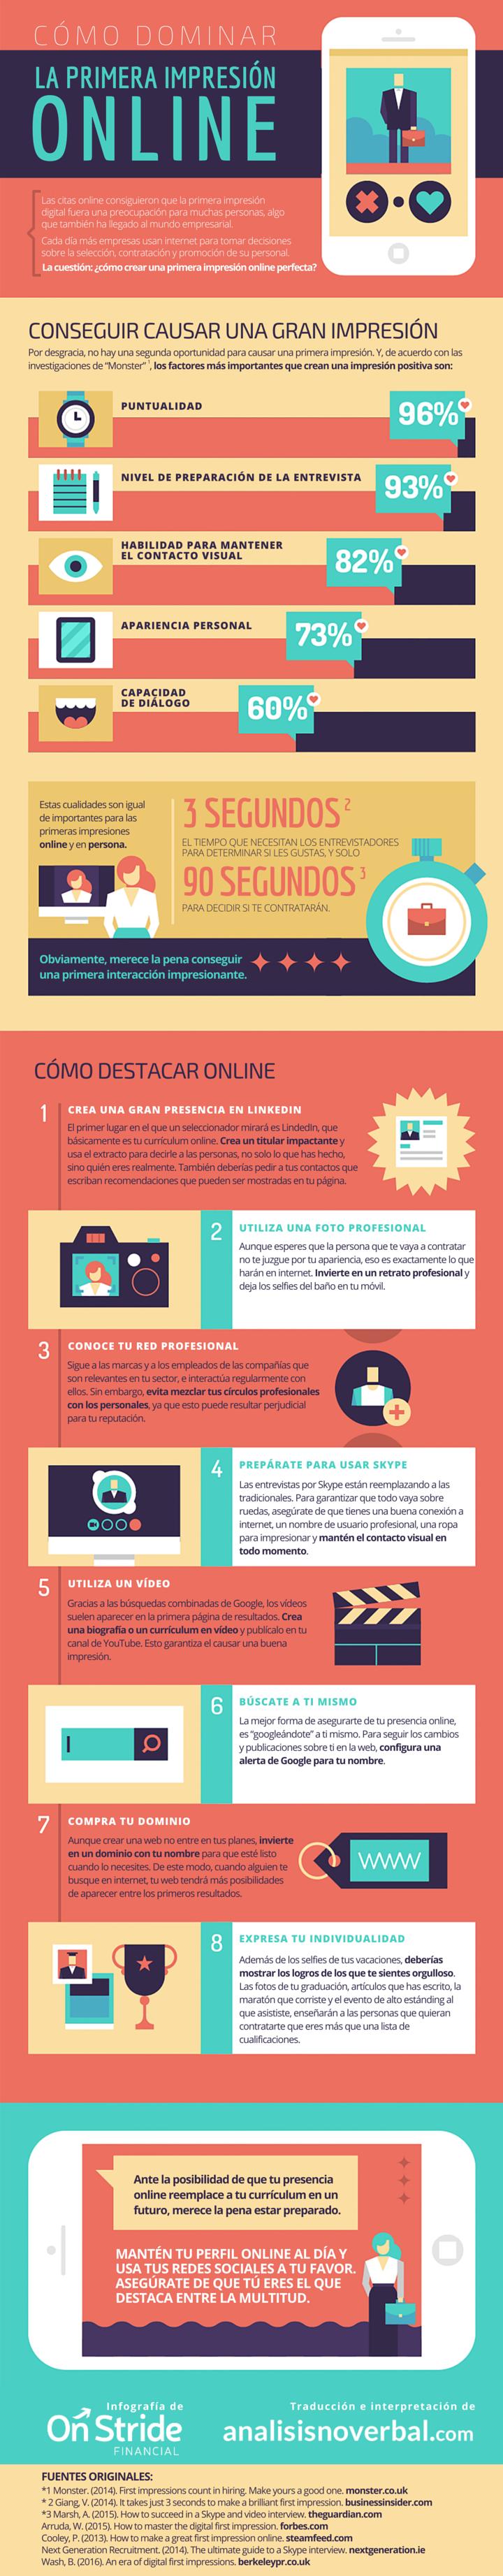 La-primera-impresion-online.-InfografiaBranding